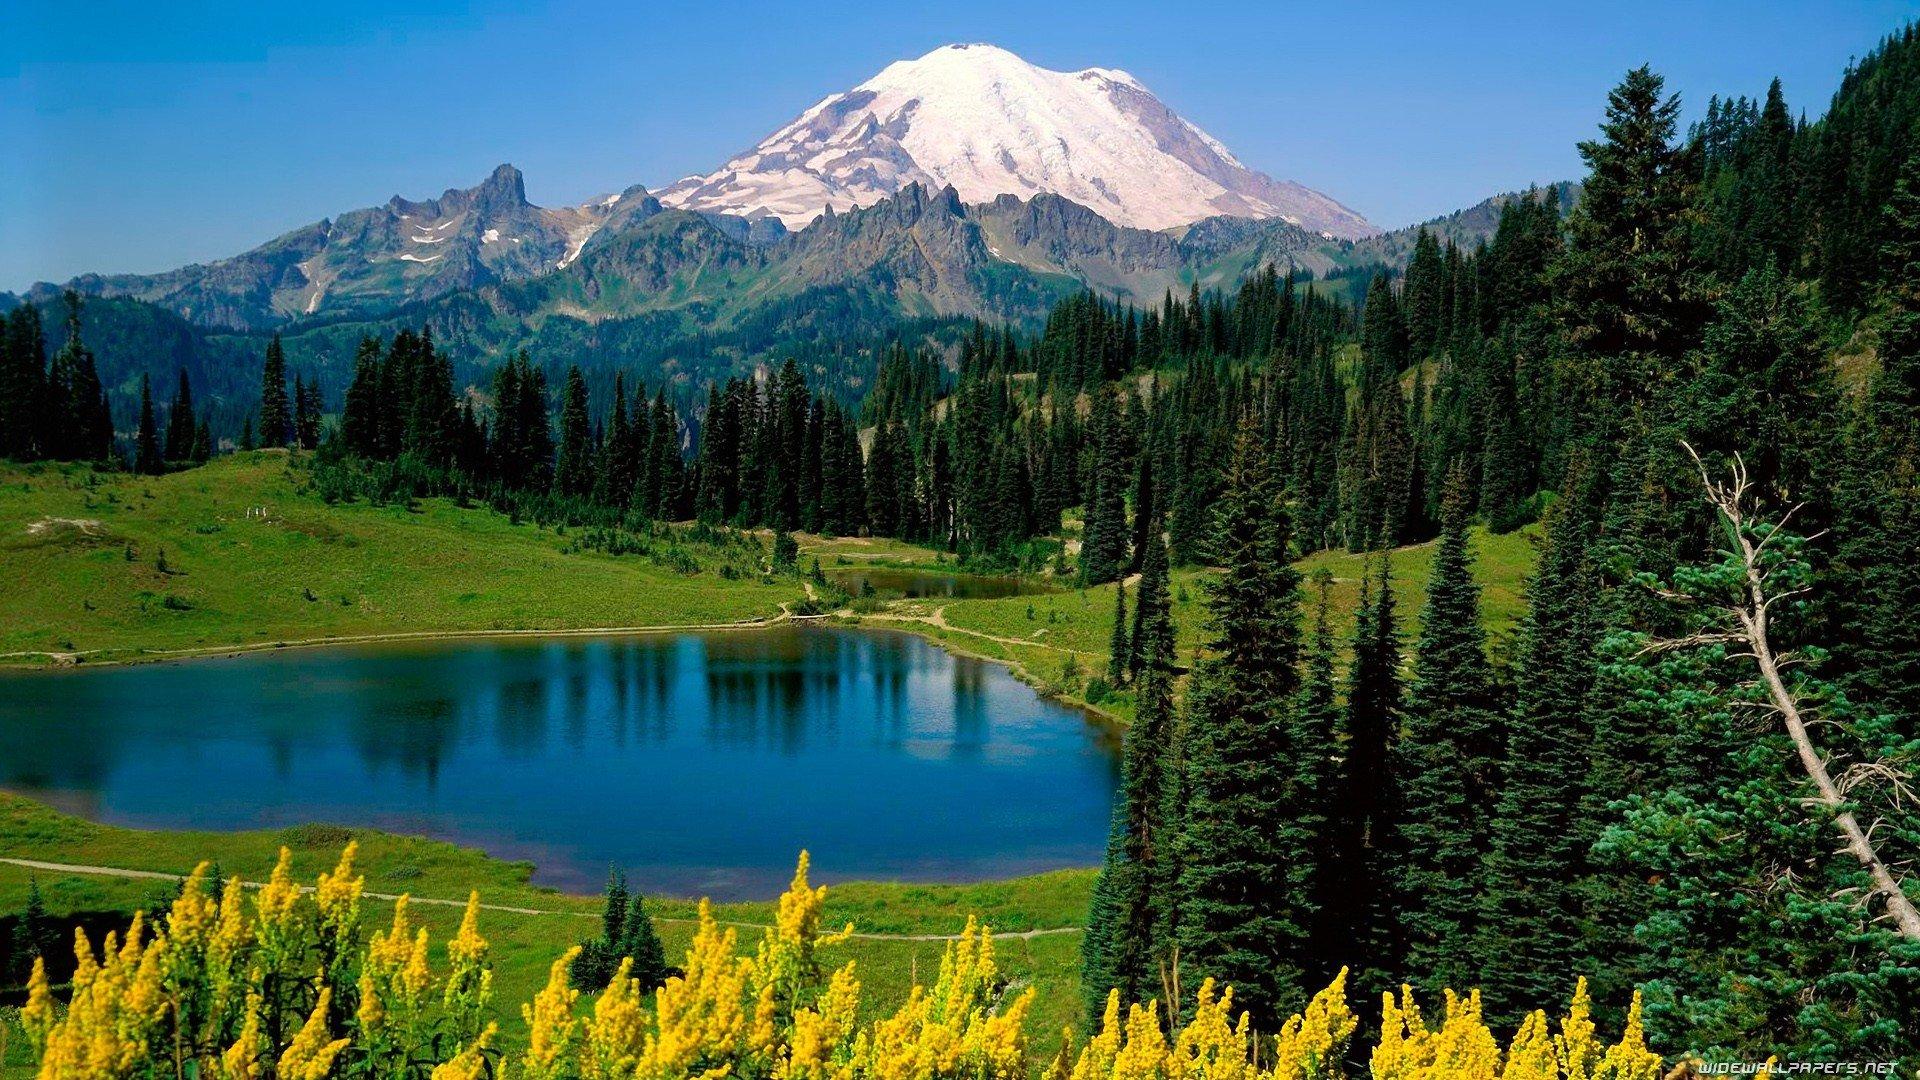 mountains landscapes nature forests National Park Mount Rainier Washington State wallpaper background